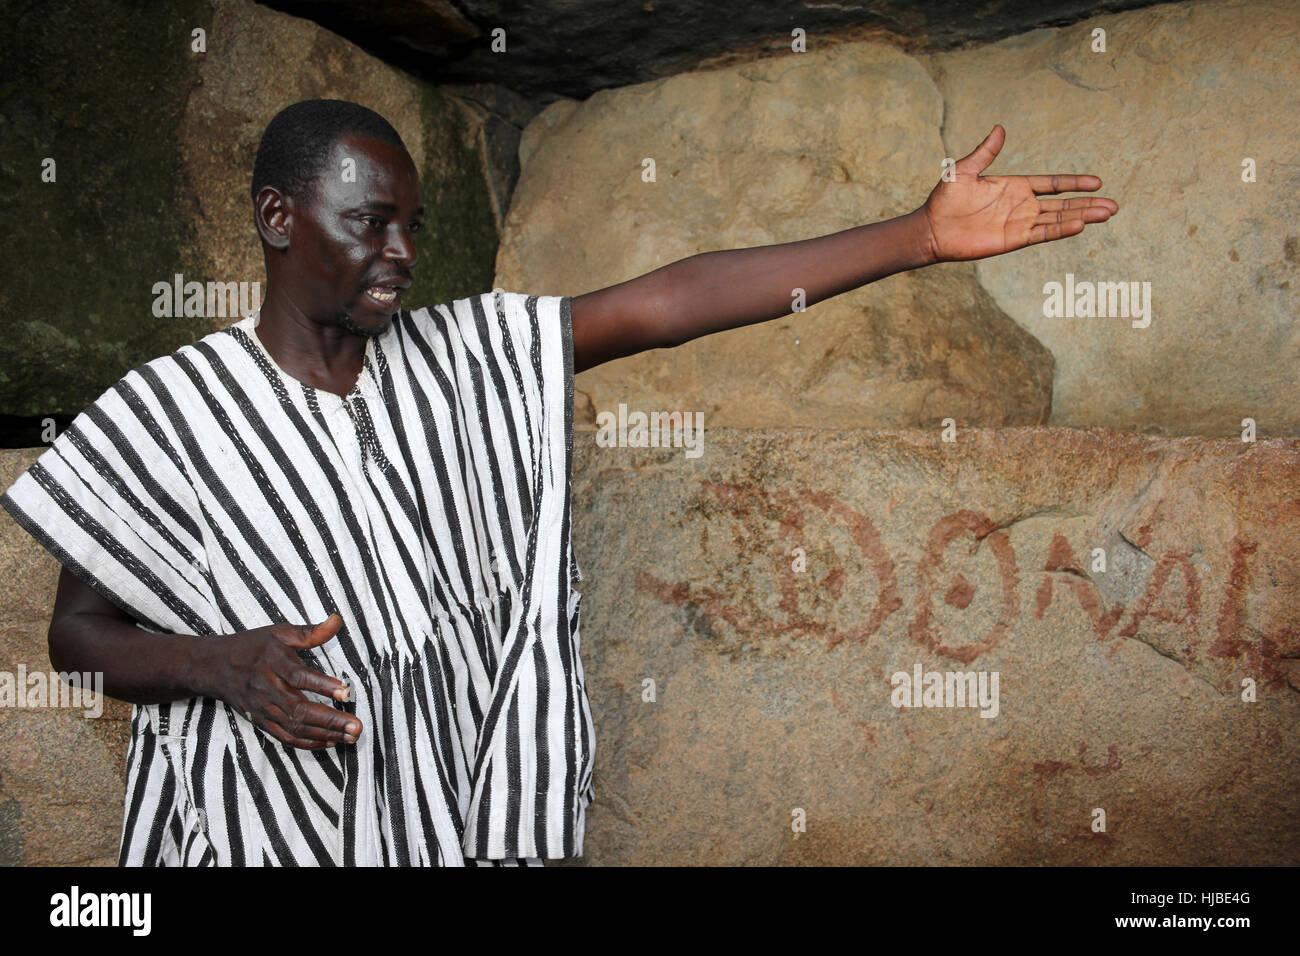 Ghanaian Guide In Cave At Talensi Tribal Village - Tengzug, Ghana - Stock Image